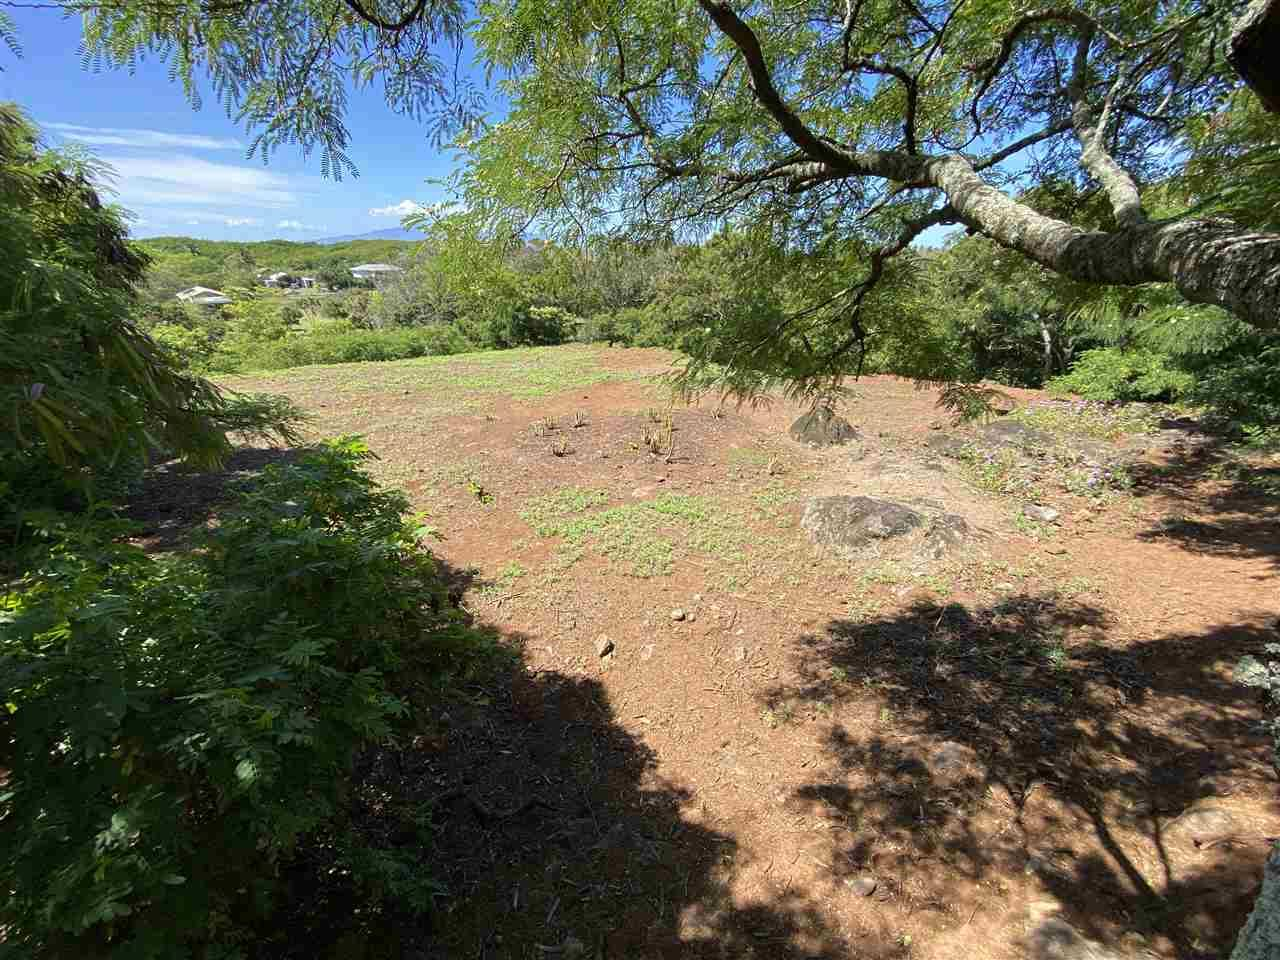 Photo of E Kamehameha V Hwy, Kaunakakai, HI 96748 (MLS # 391083)